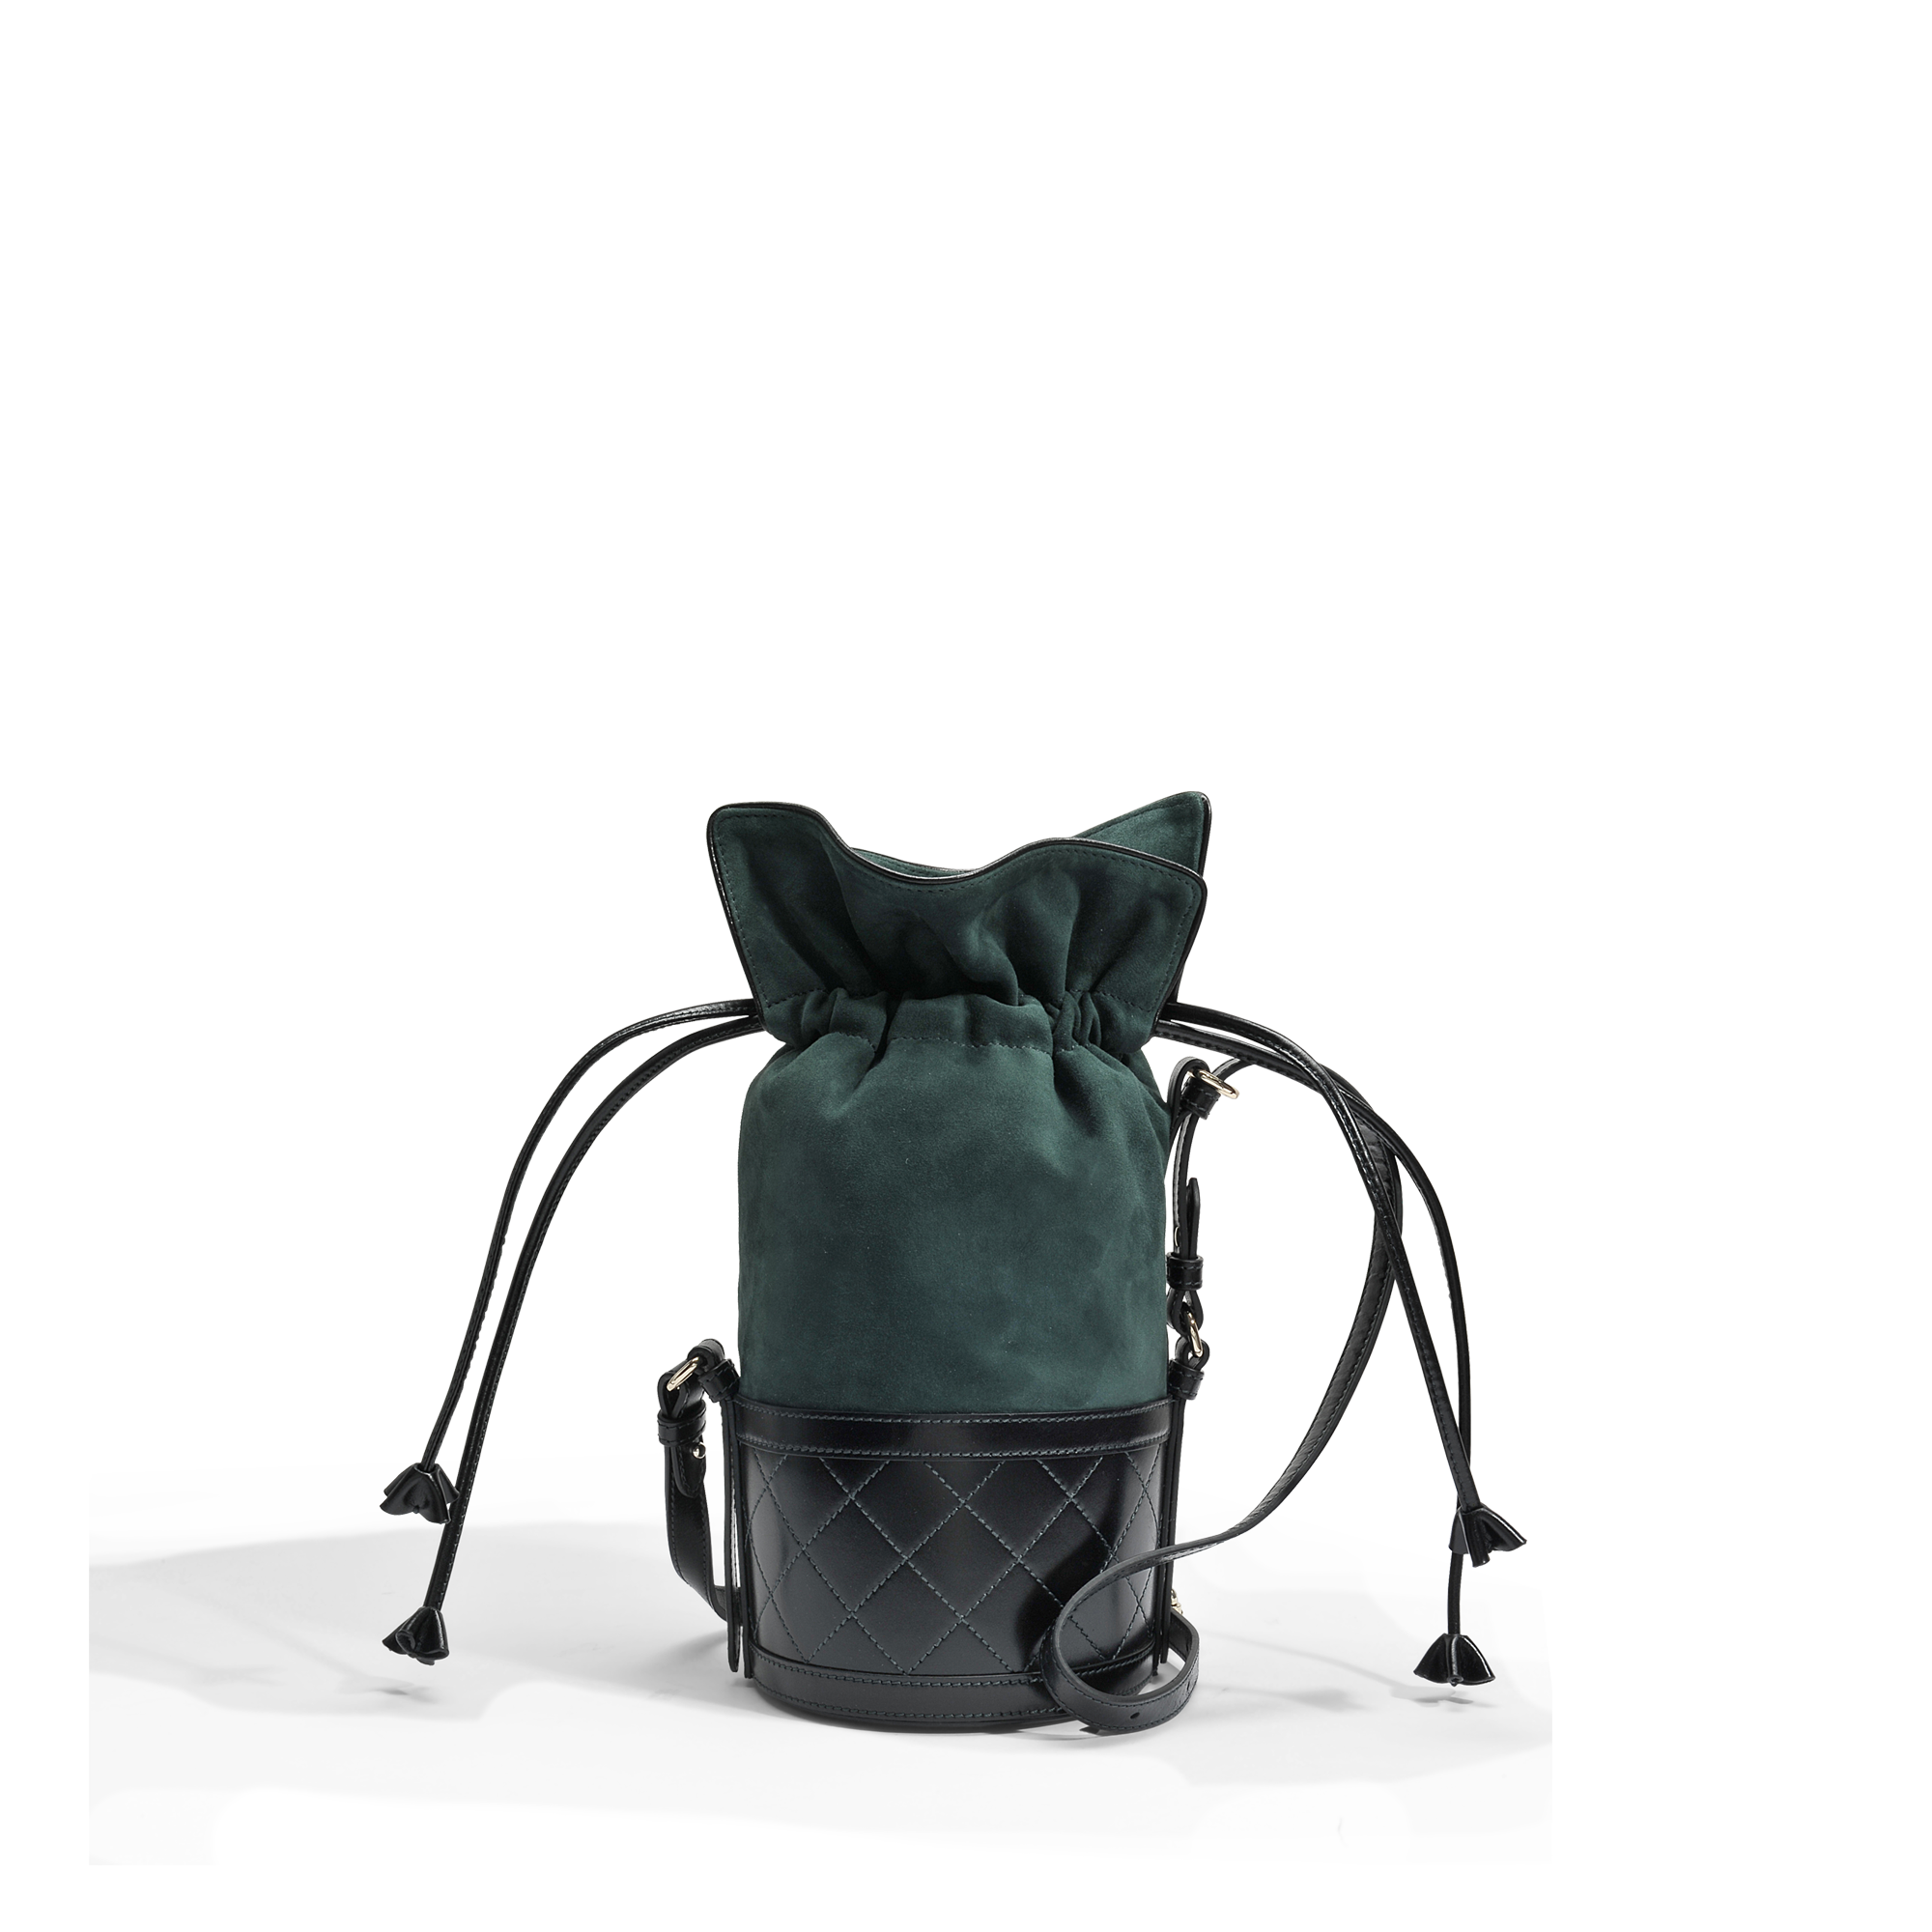 Carven Sully Mini Bag MJ2yx77mu